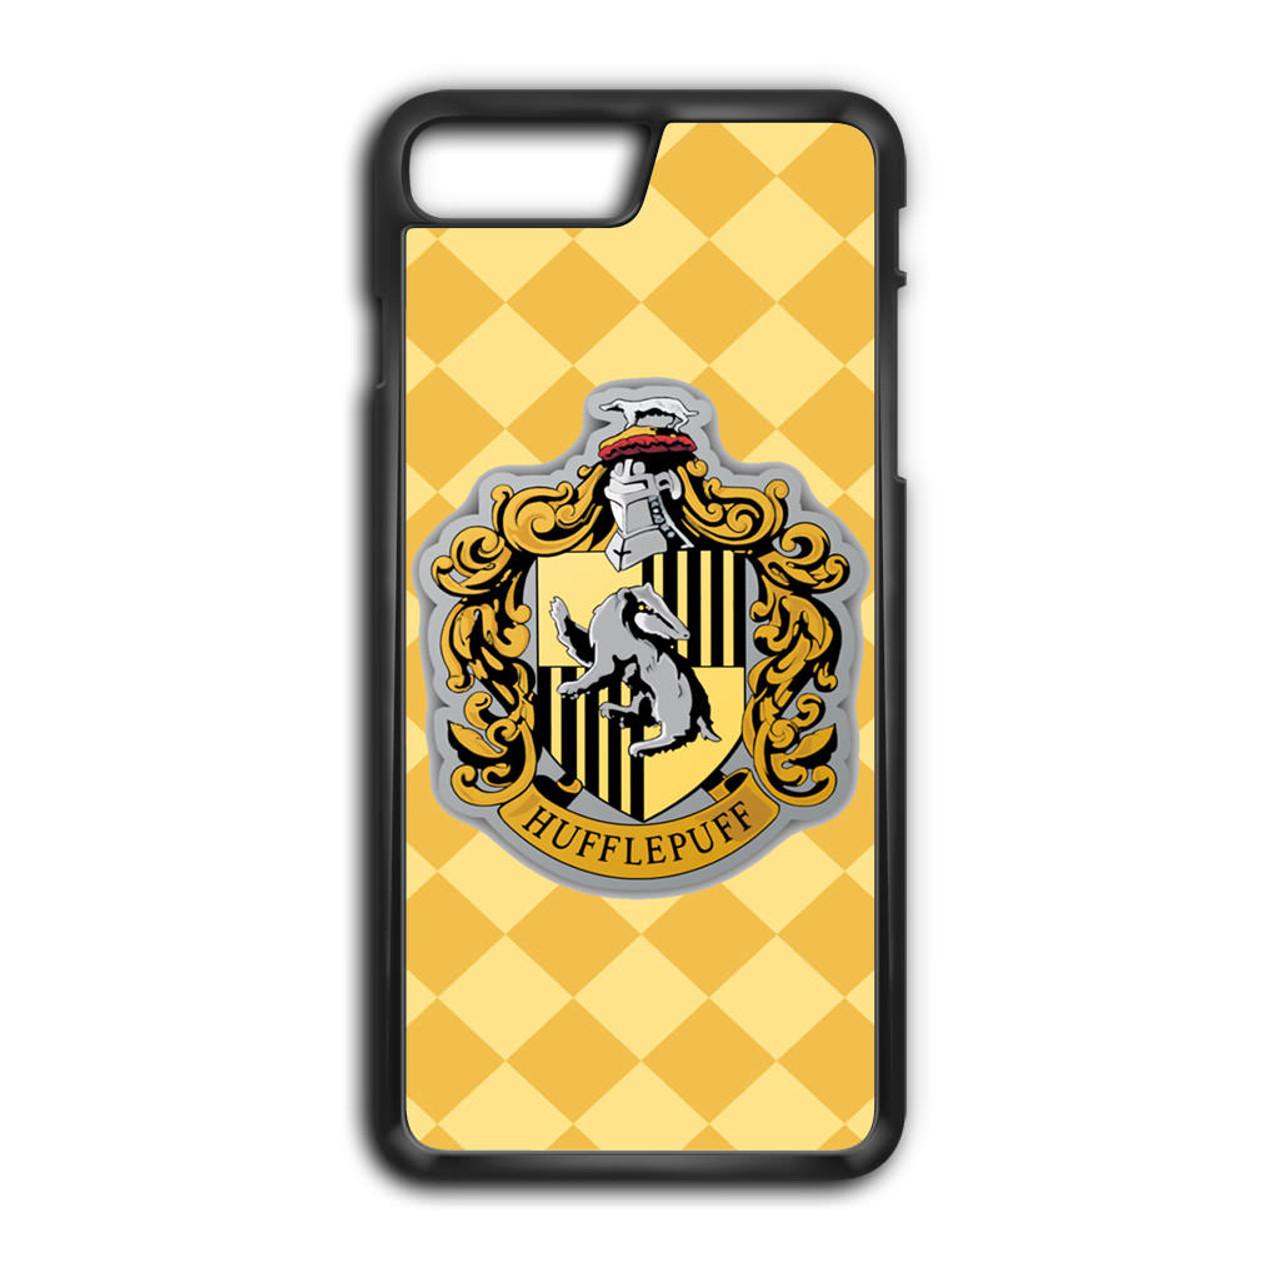 hufflepuff iphone 8 plus case